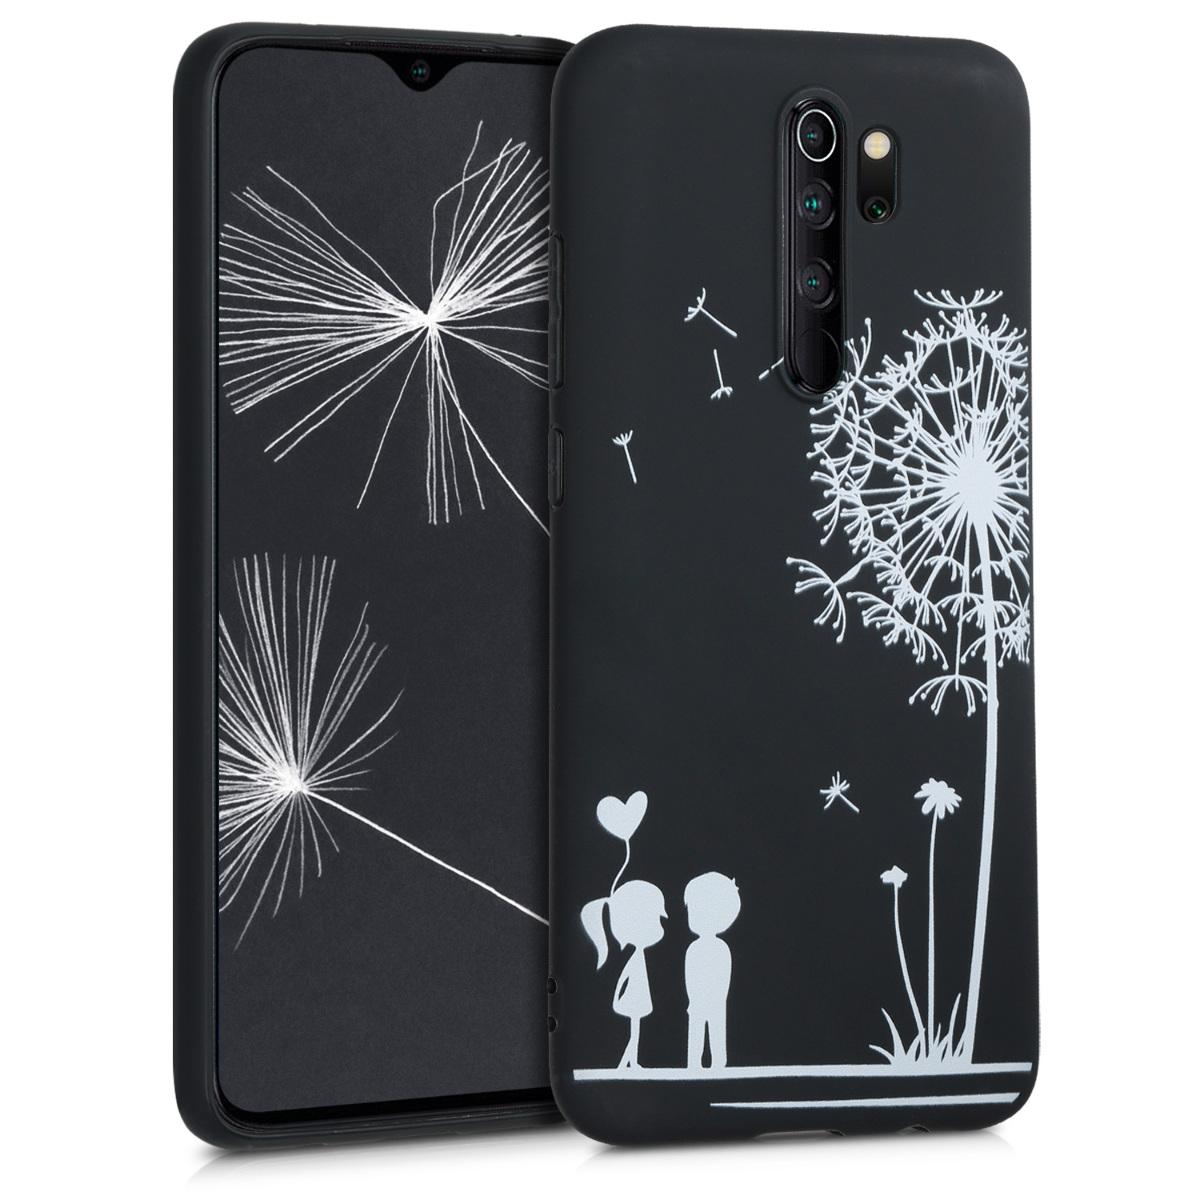 KW Θήκη Σιλικόνης Xiaomi Redmi Note 8 Pro - Dandelion Love - White / Black (50249.02)